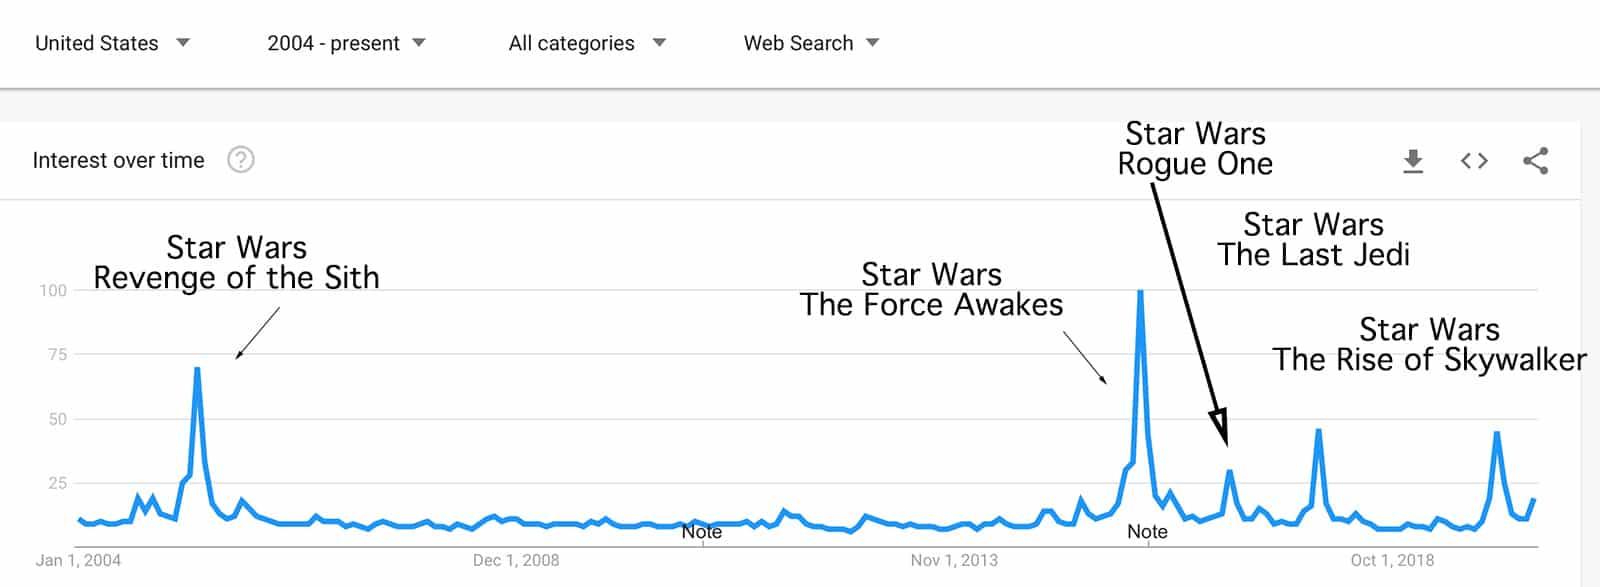 Star Wars in Google Trends